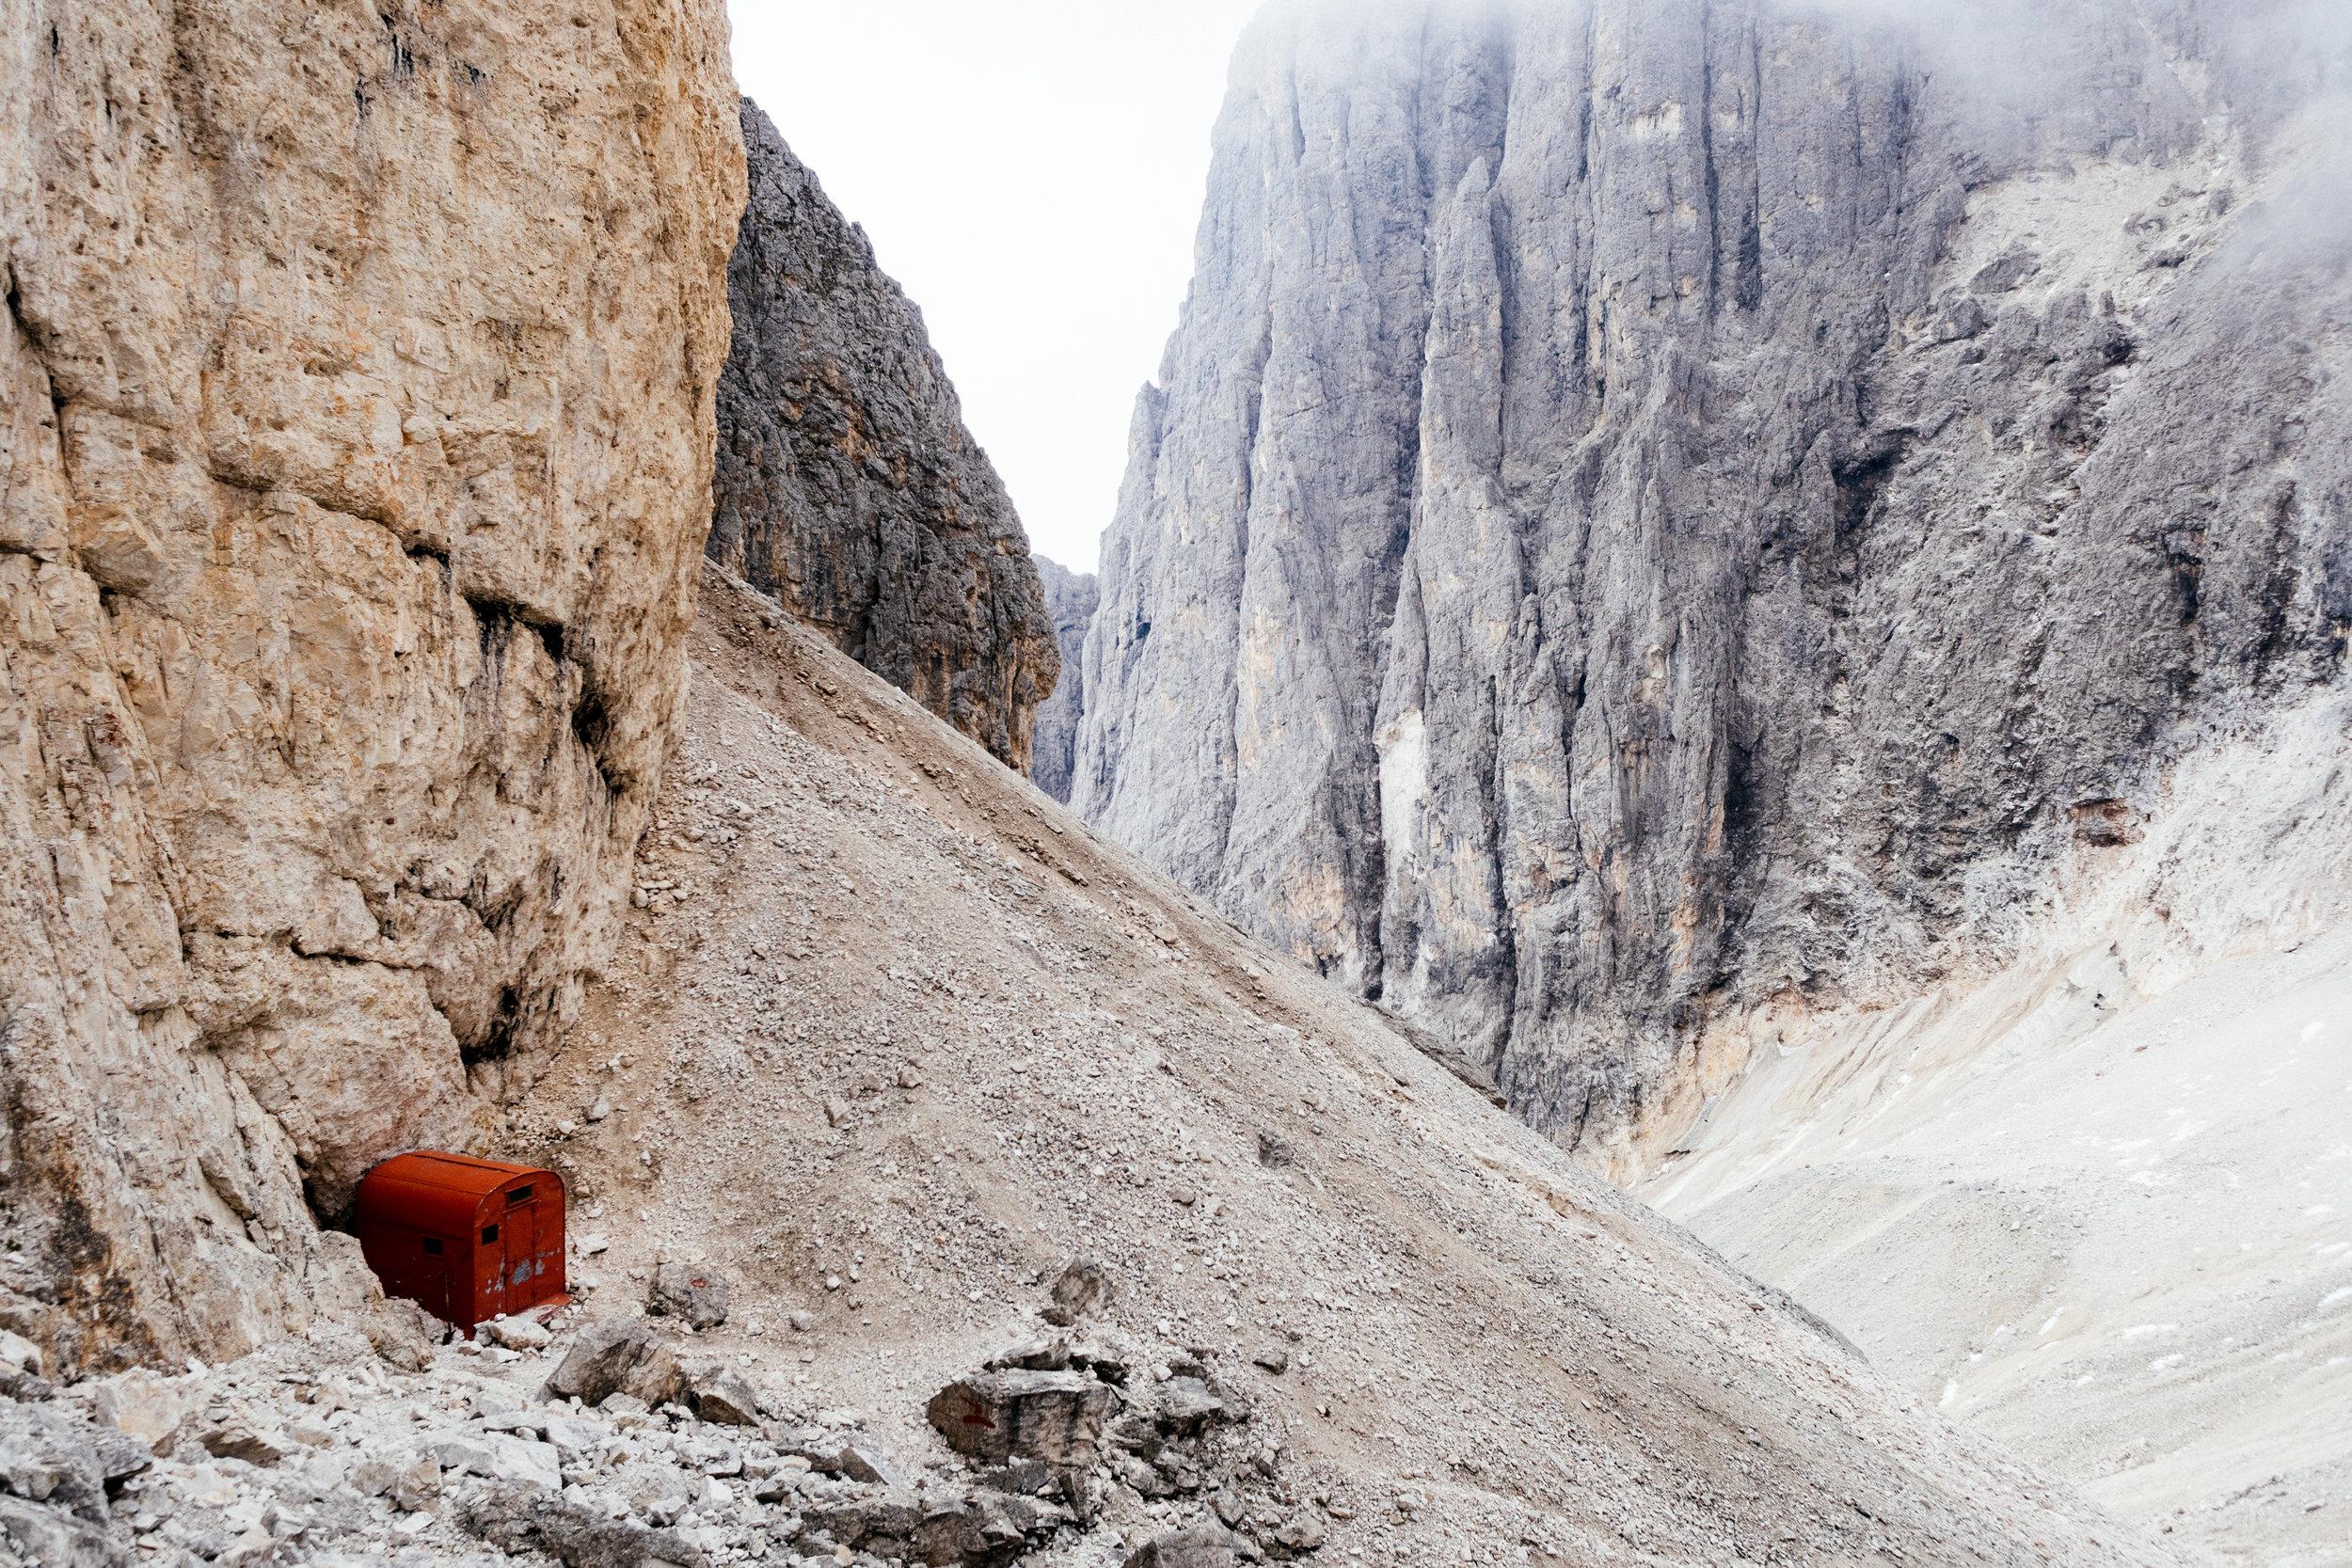 Dolomites-ChrisBrinleeJr-SEP17-73.jpg